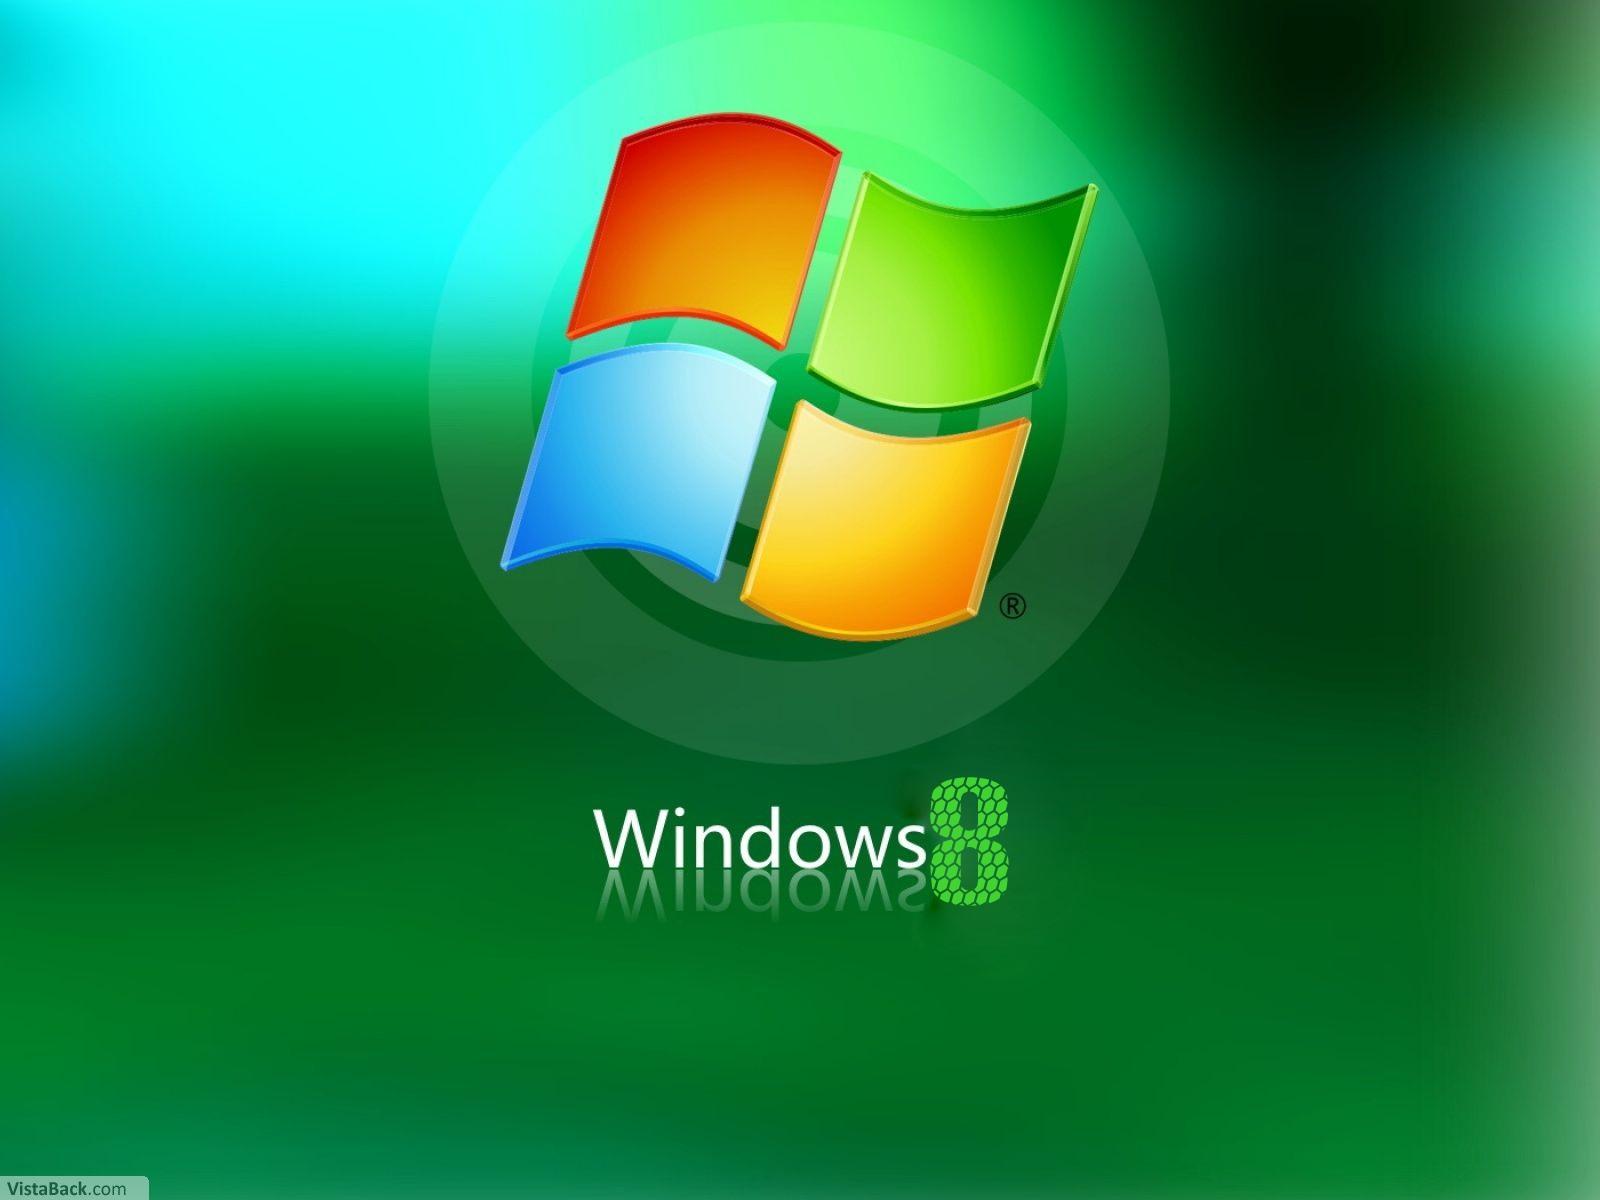 Windows 8 Official Wallpaper Desktop Wallpapers 1024x1024: UNeedAllinside: 20 Windows 8 Preview Wallpapers Official